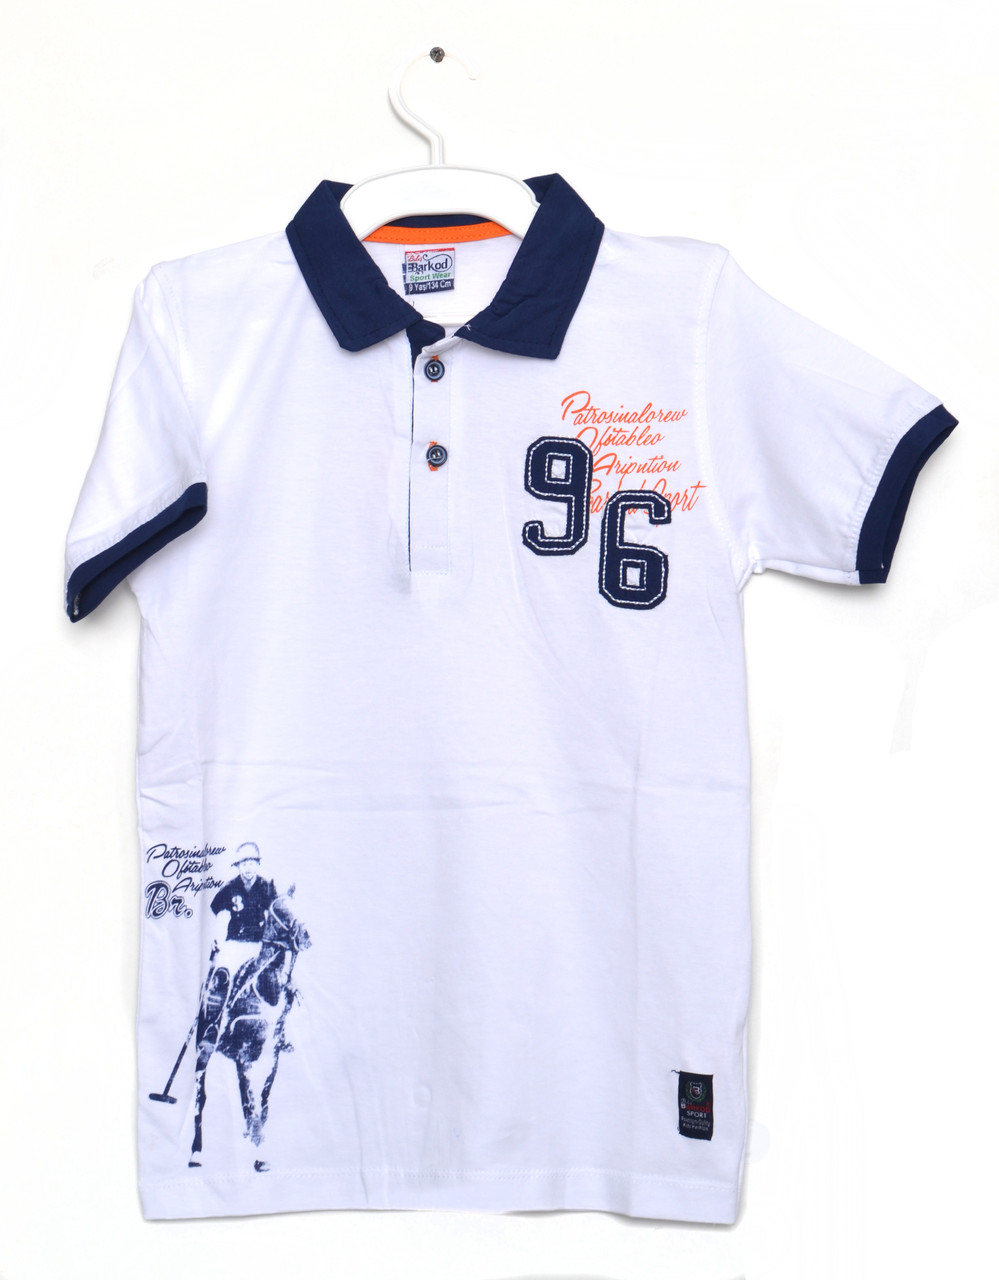 c00e86502ae Рубашка трикотажная для мальчика